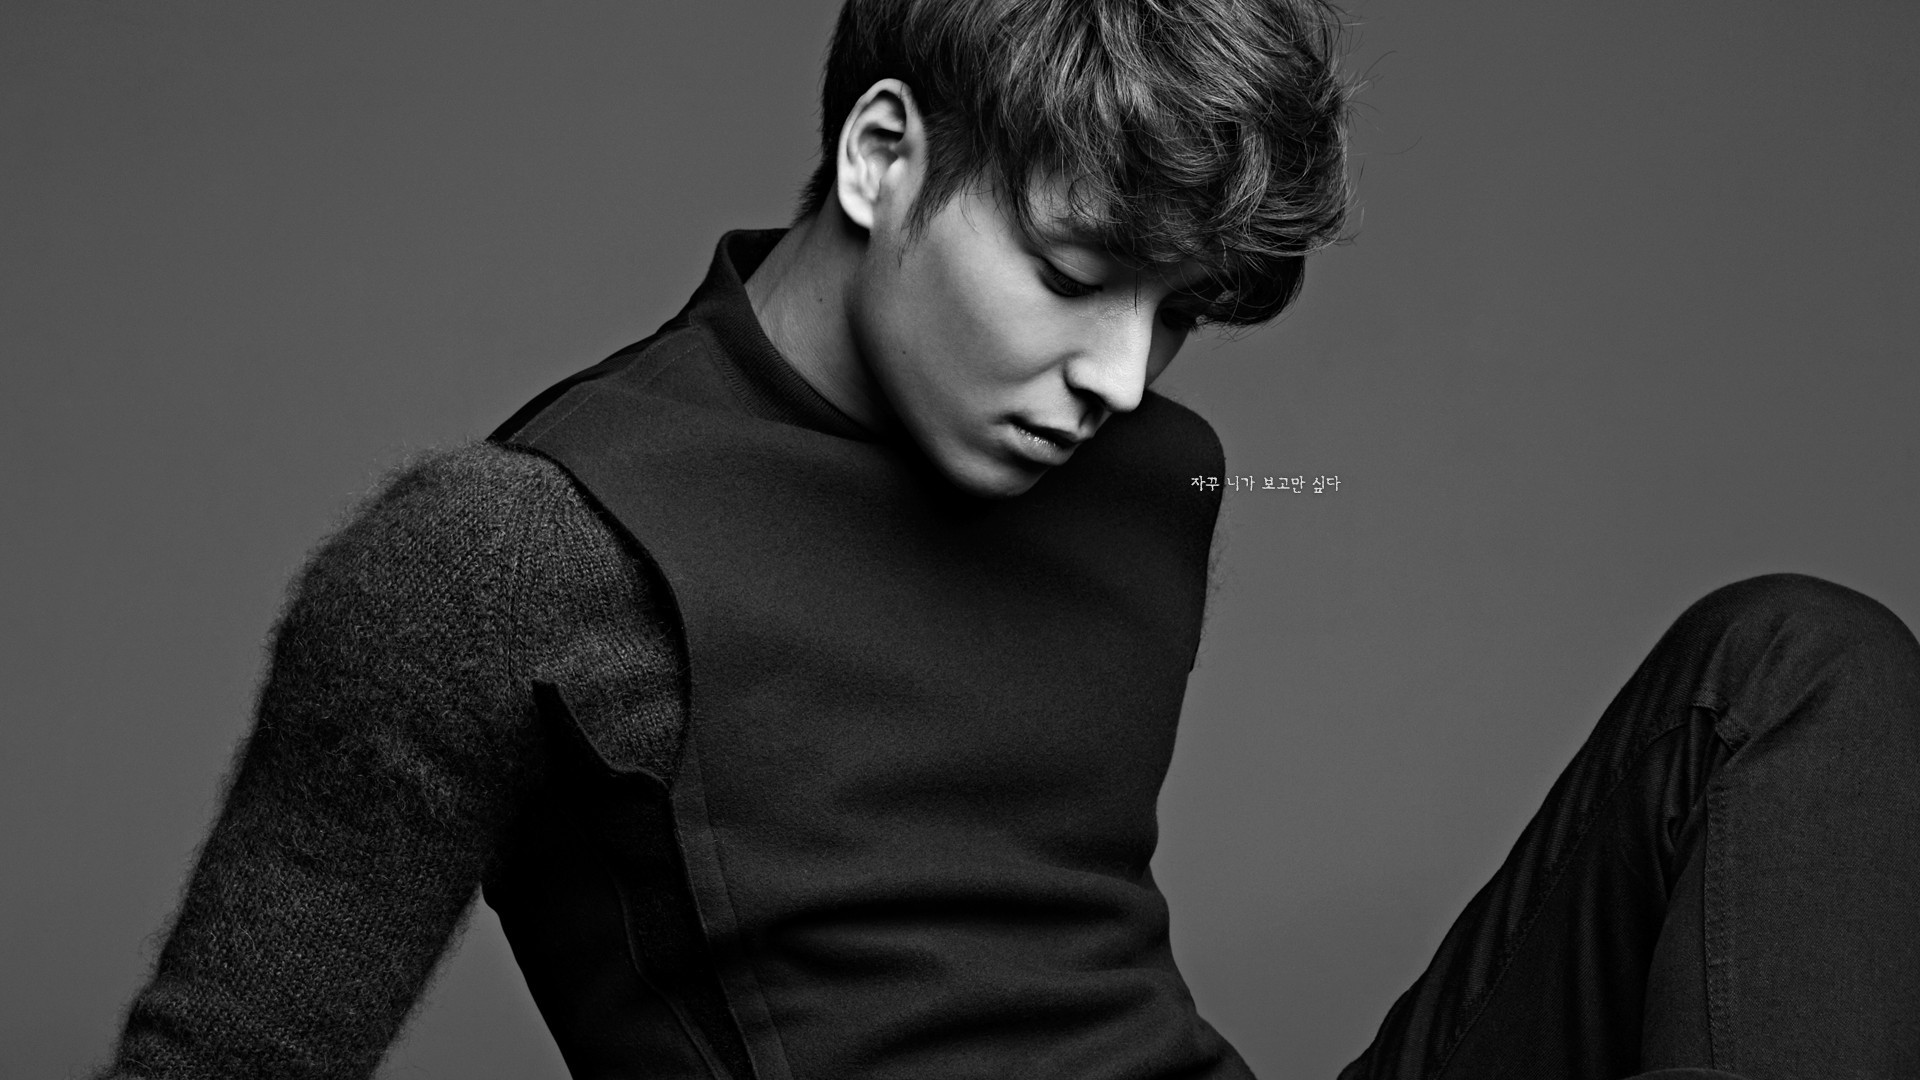 101113 - jonghun photo teaser @ the mood